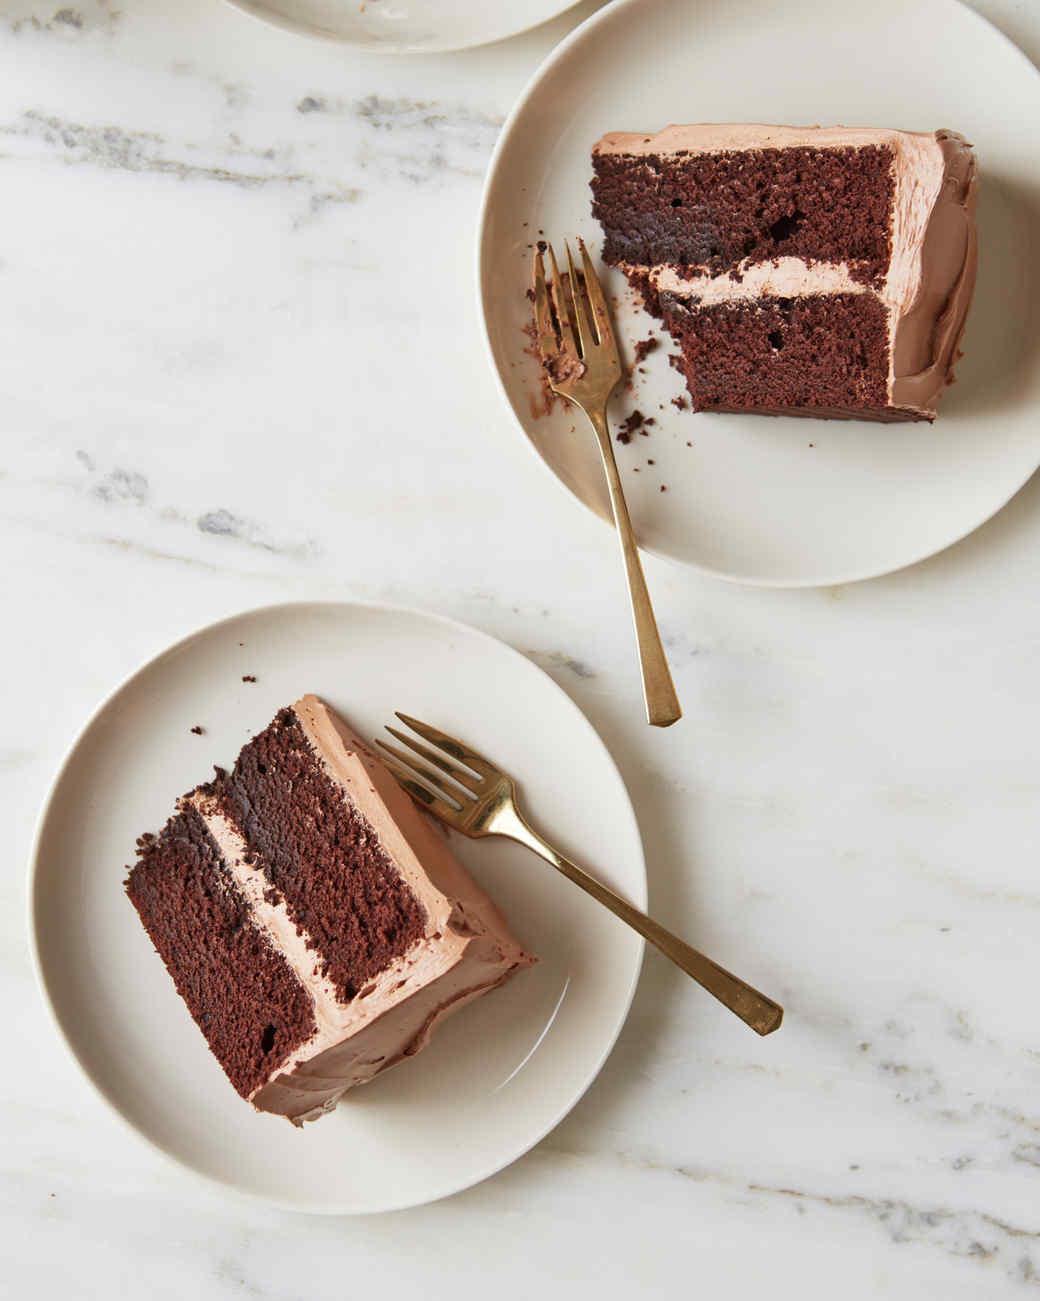 devils-food-cake-beauty-395-d112204-0915.jpg